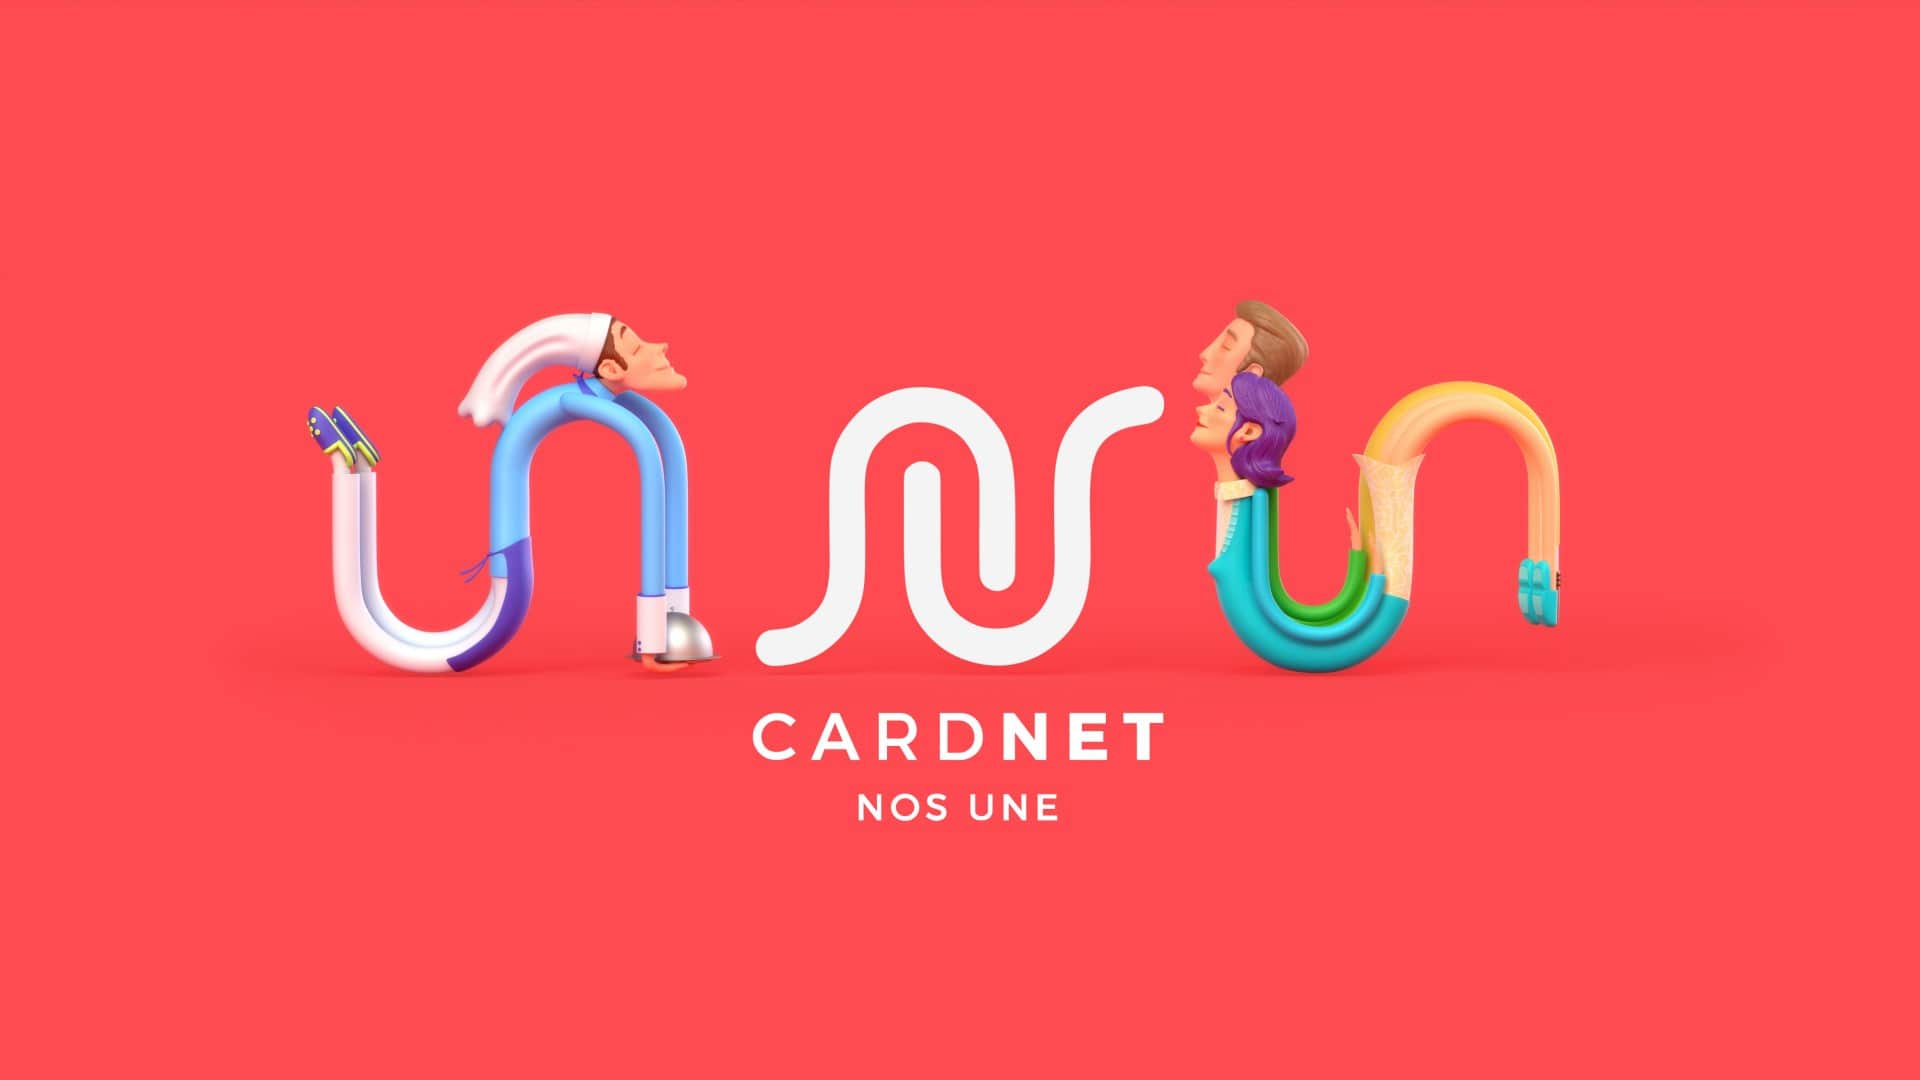 Cardnet Dominicana